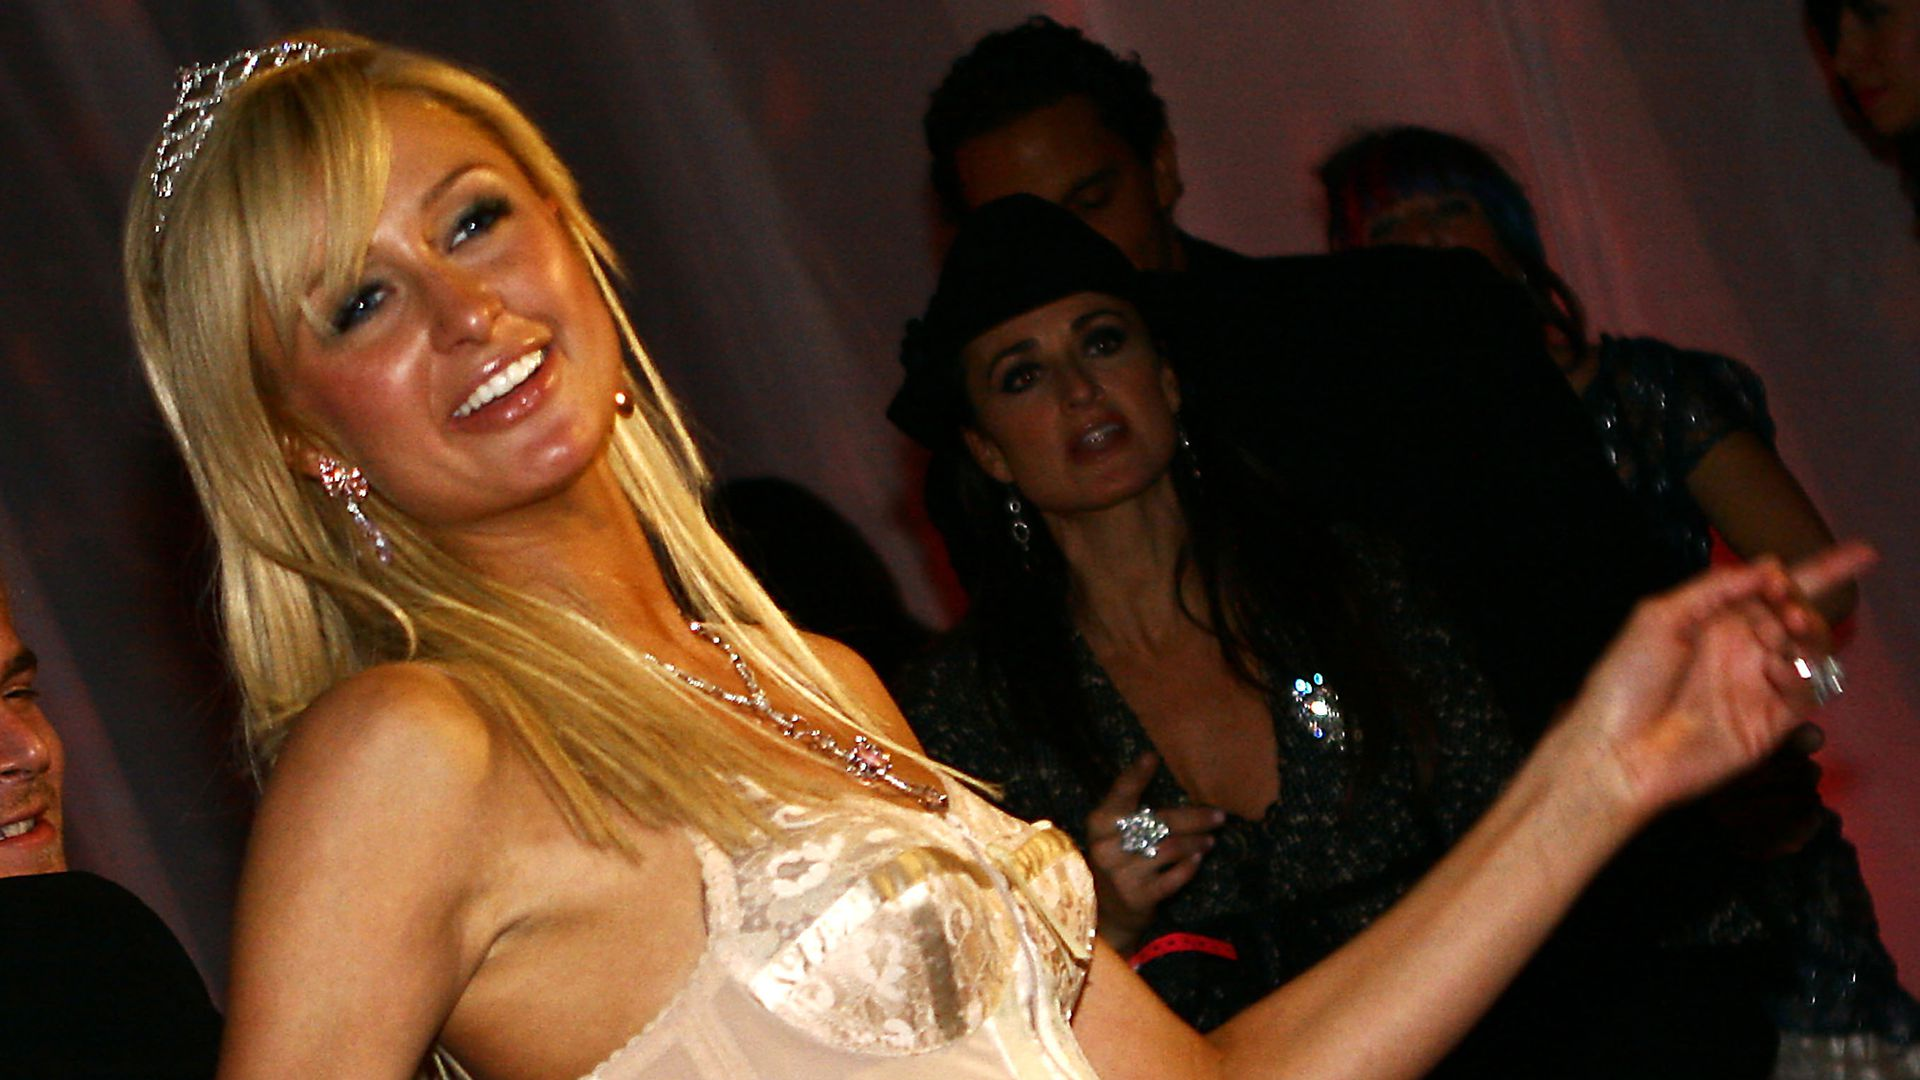 Große Veränderung So Sah Paris Hilton Früher Aus Promiflash De